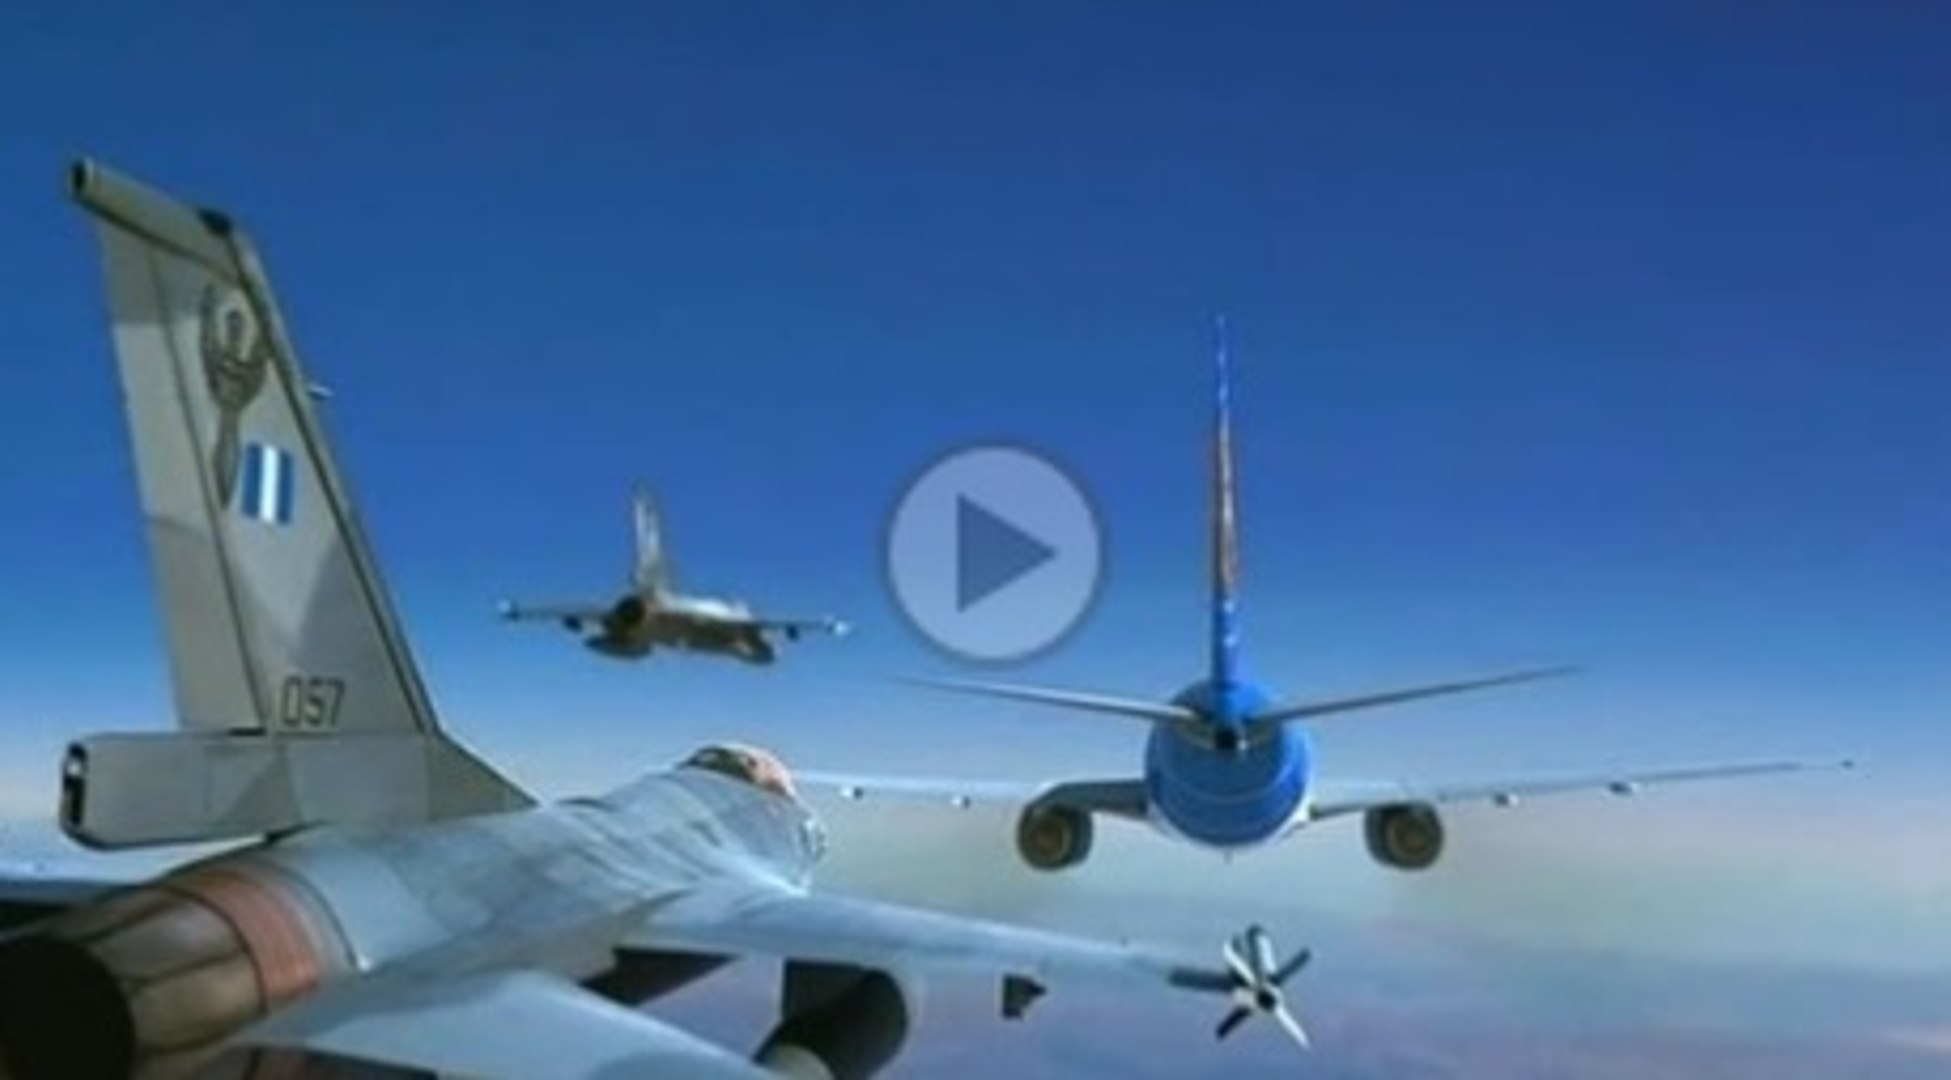 Air Crash Investigation-Helios Ghost Plane Flight 522 FULL